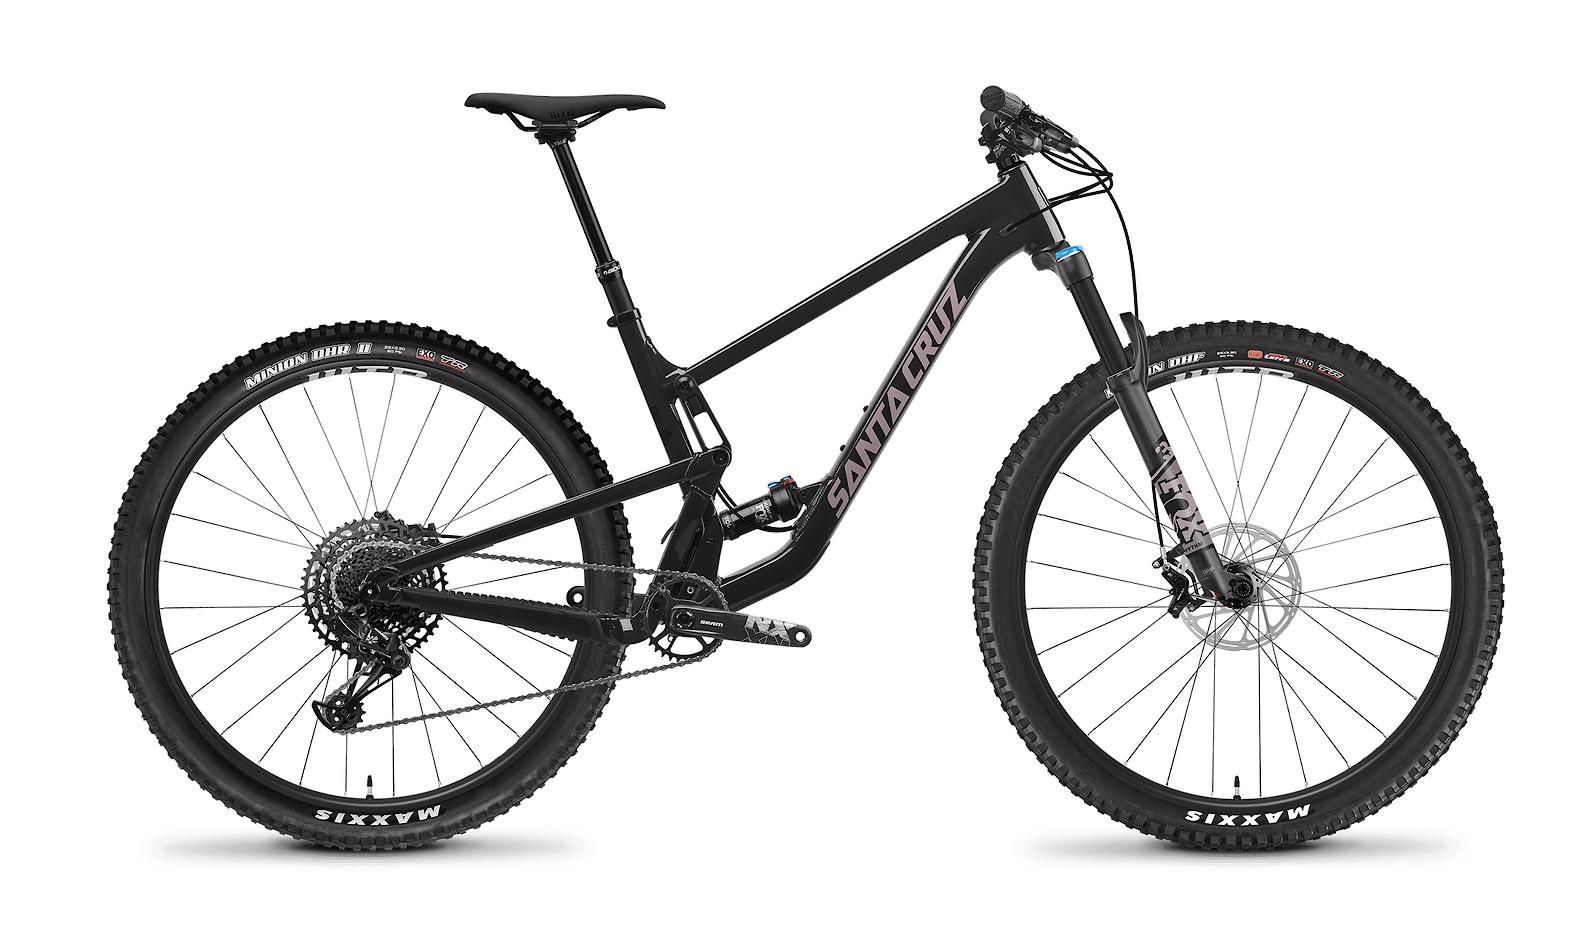 2021 Santa Cruz Tallboy R Aluminum (Glossy Black and Gypsum)